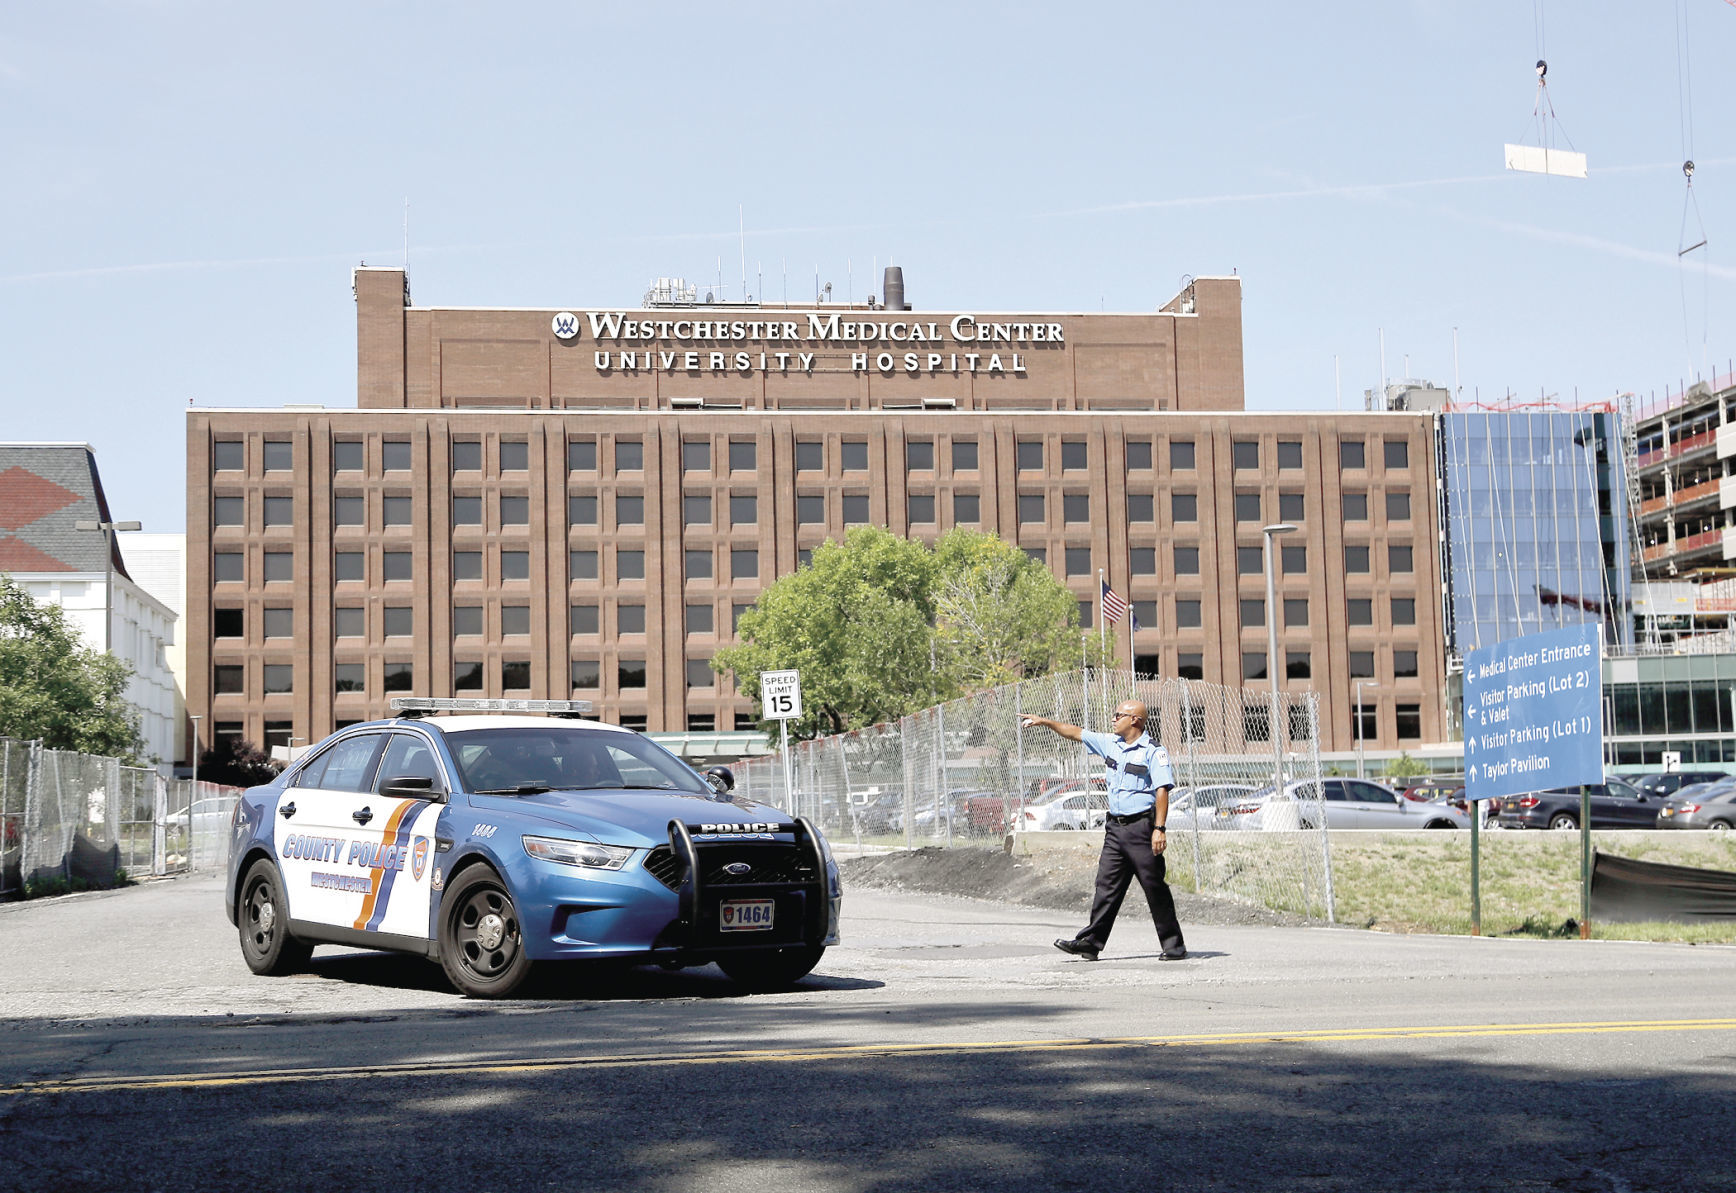 Hospital Gunfire Man shoots woman to death